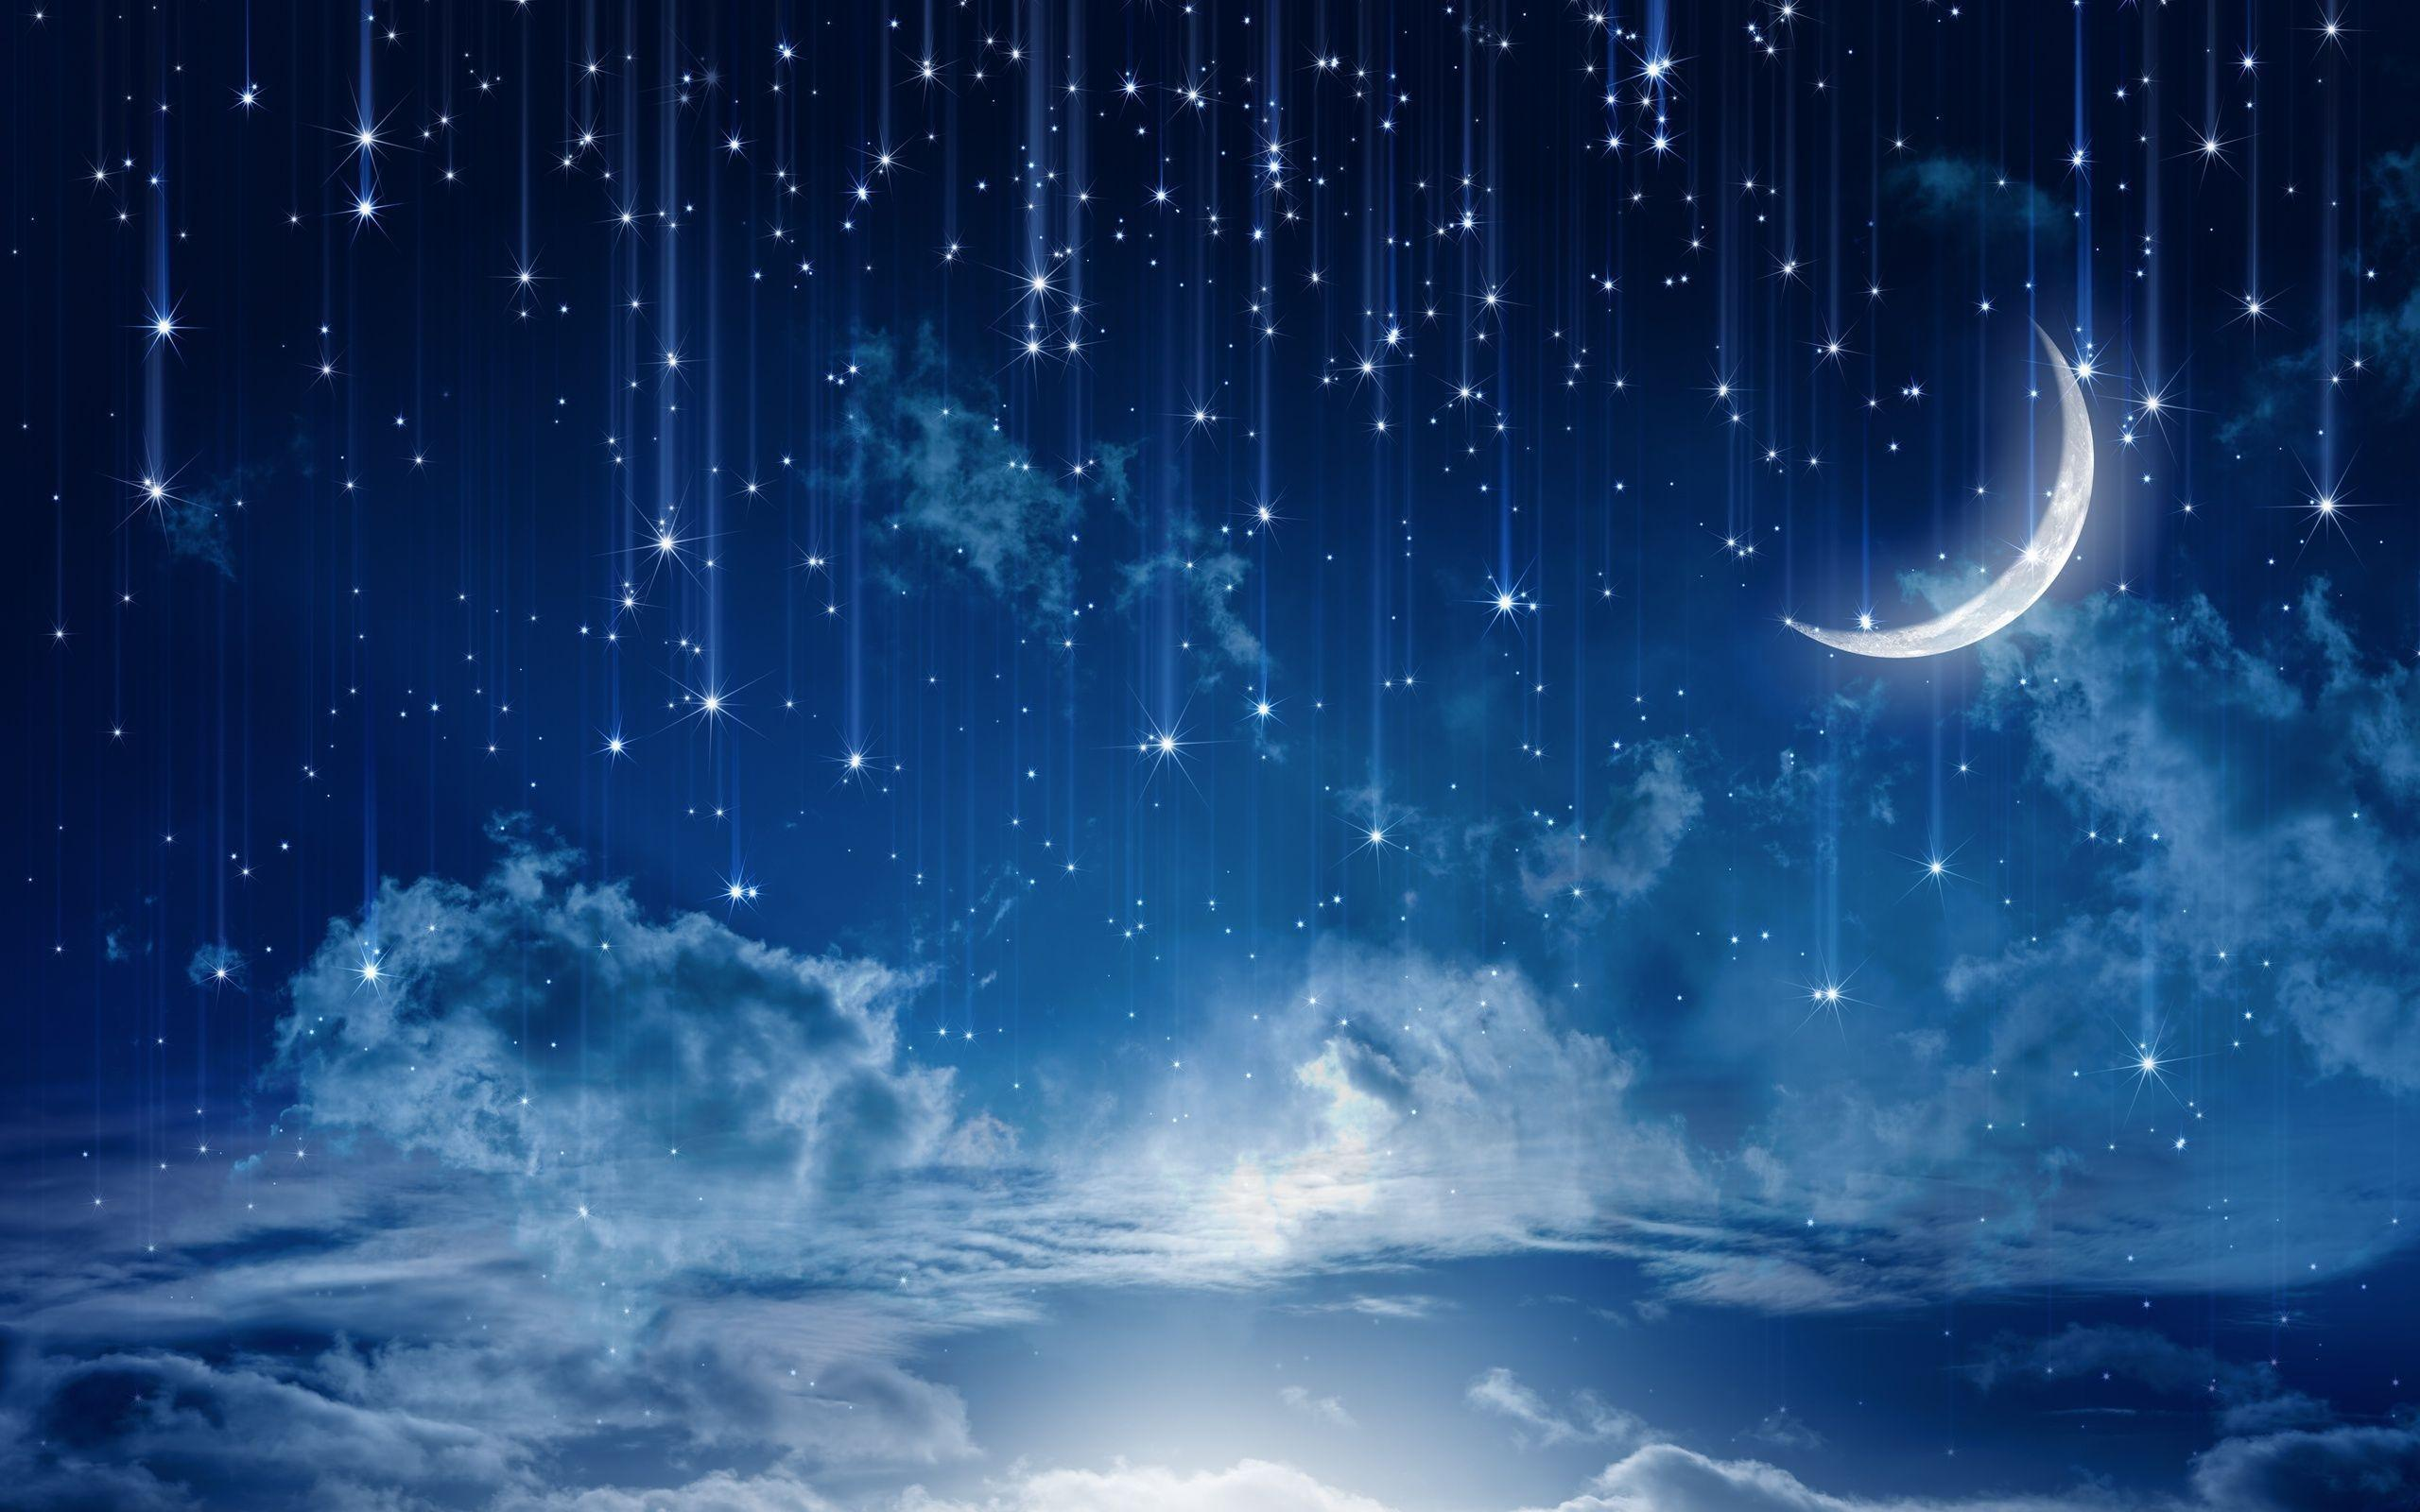 Night Moon Wallpapers - Full HD wallpaper search